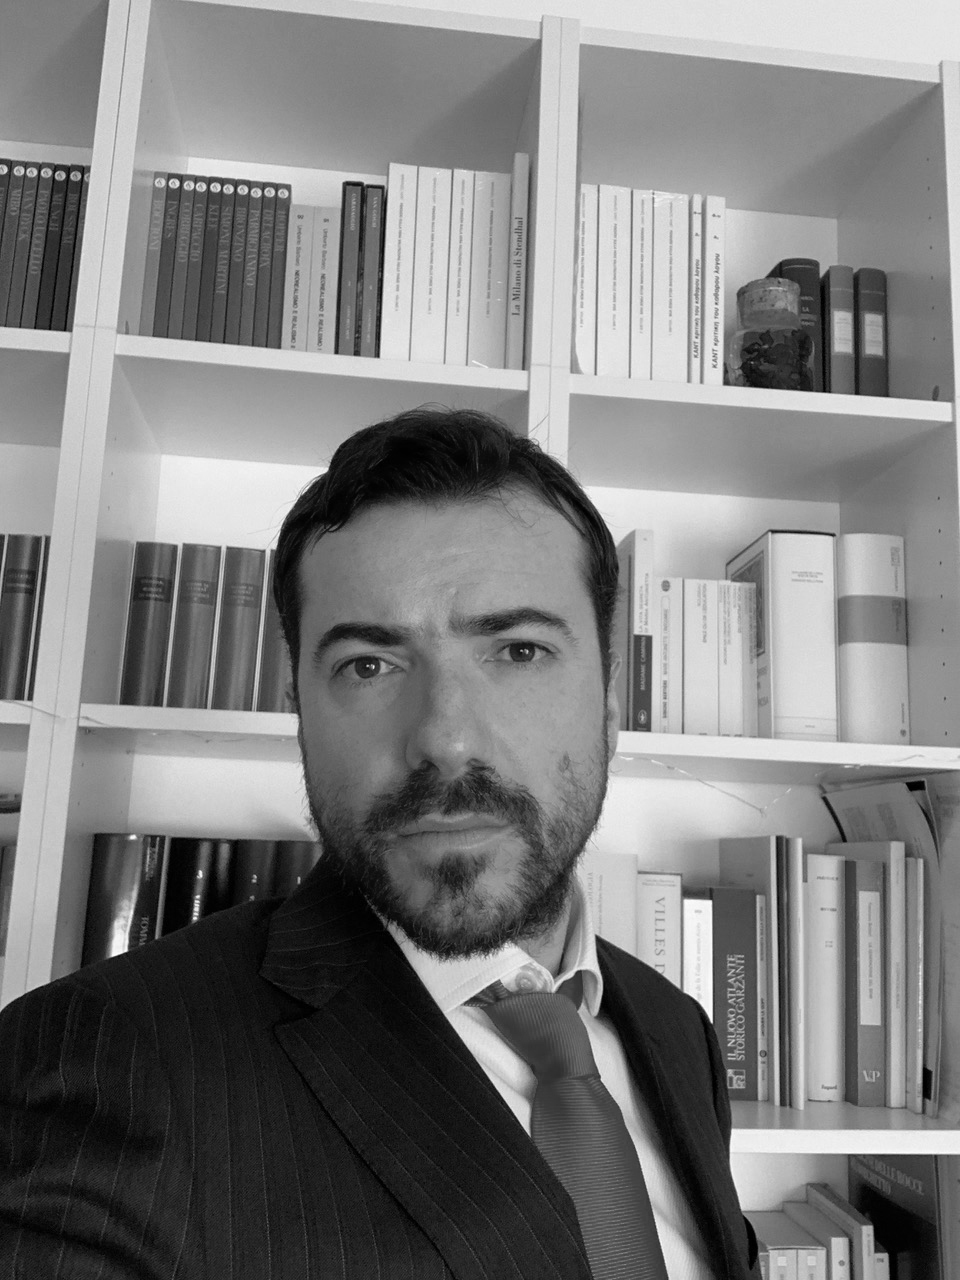 Stefano Veneroni